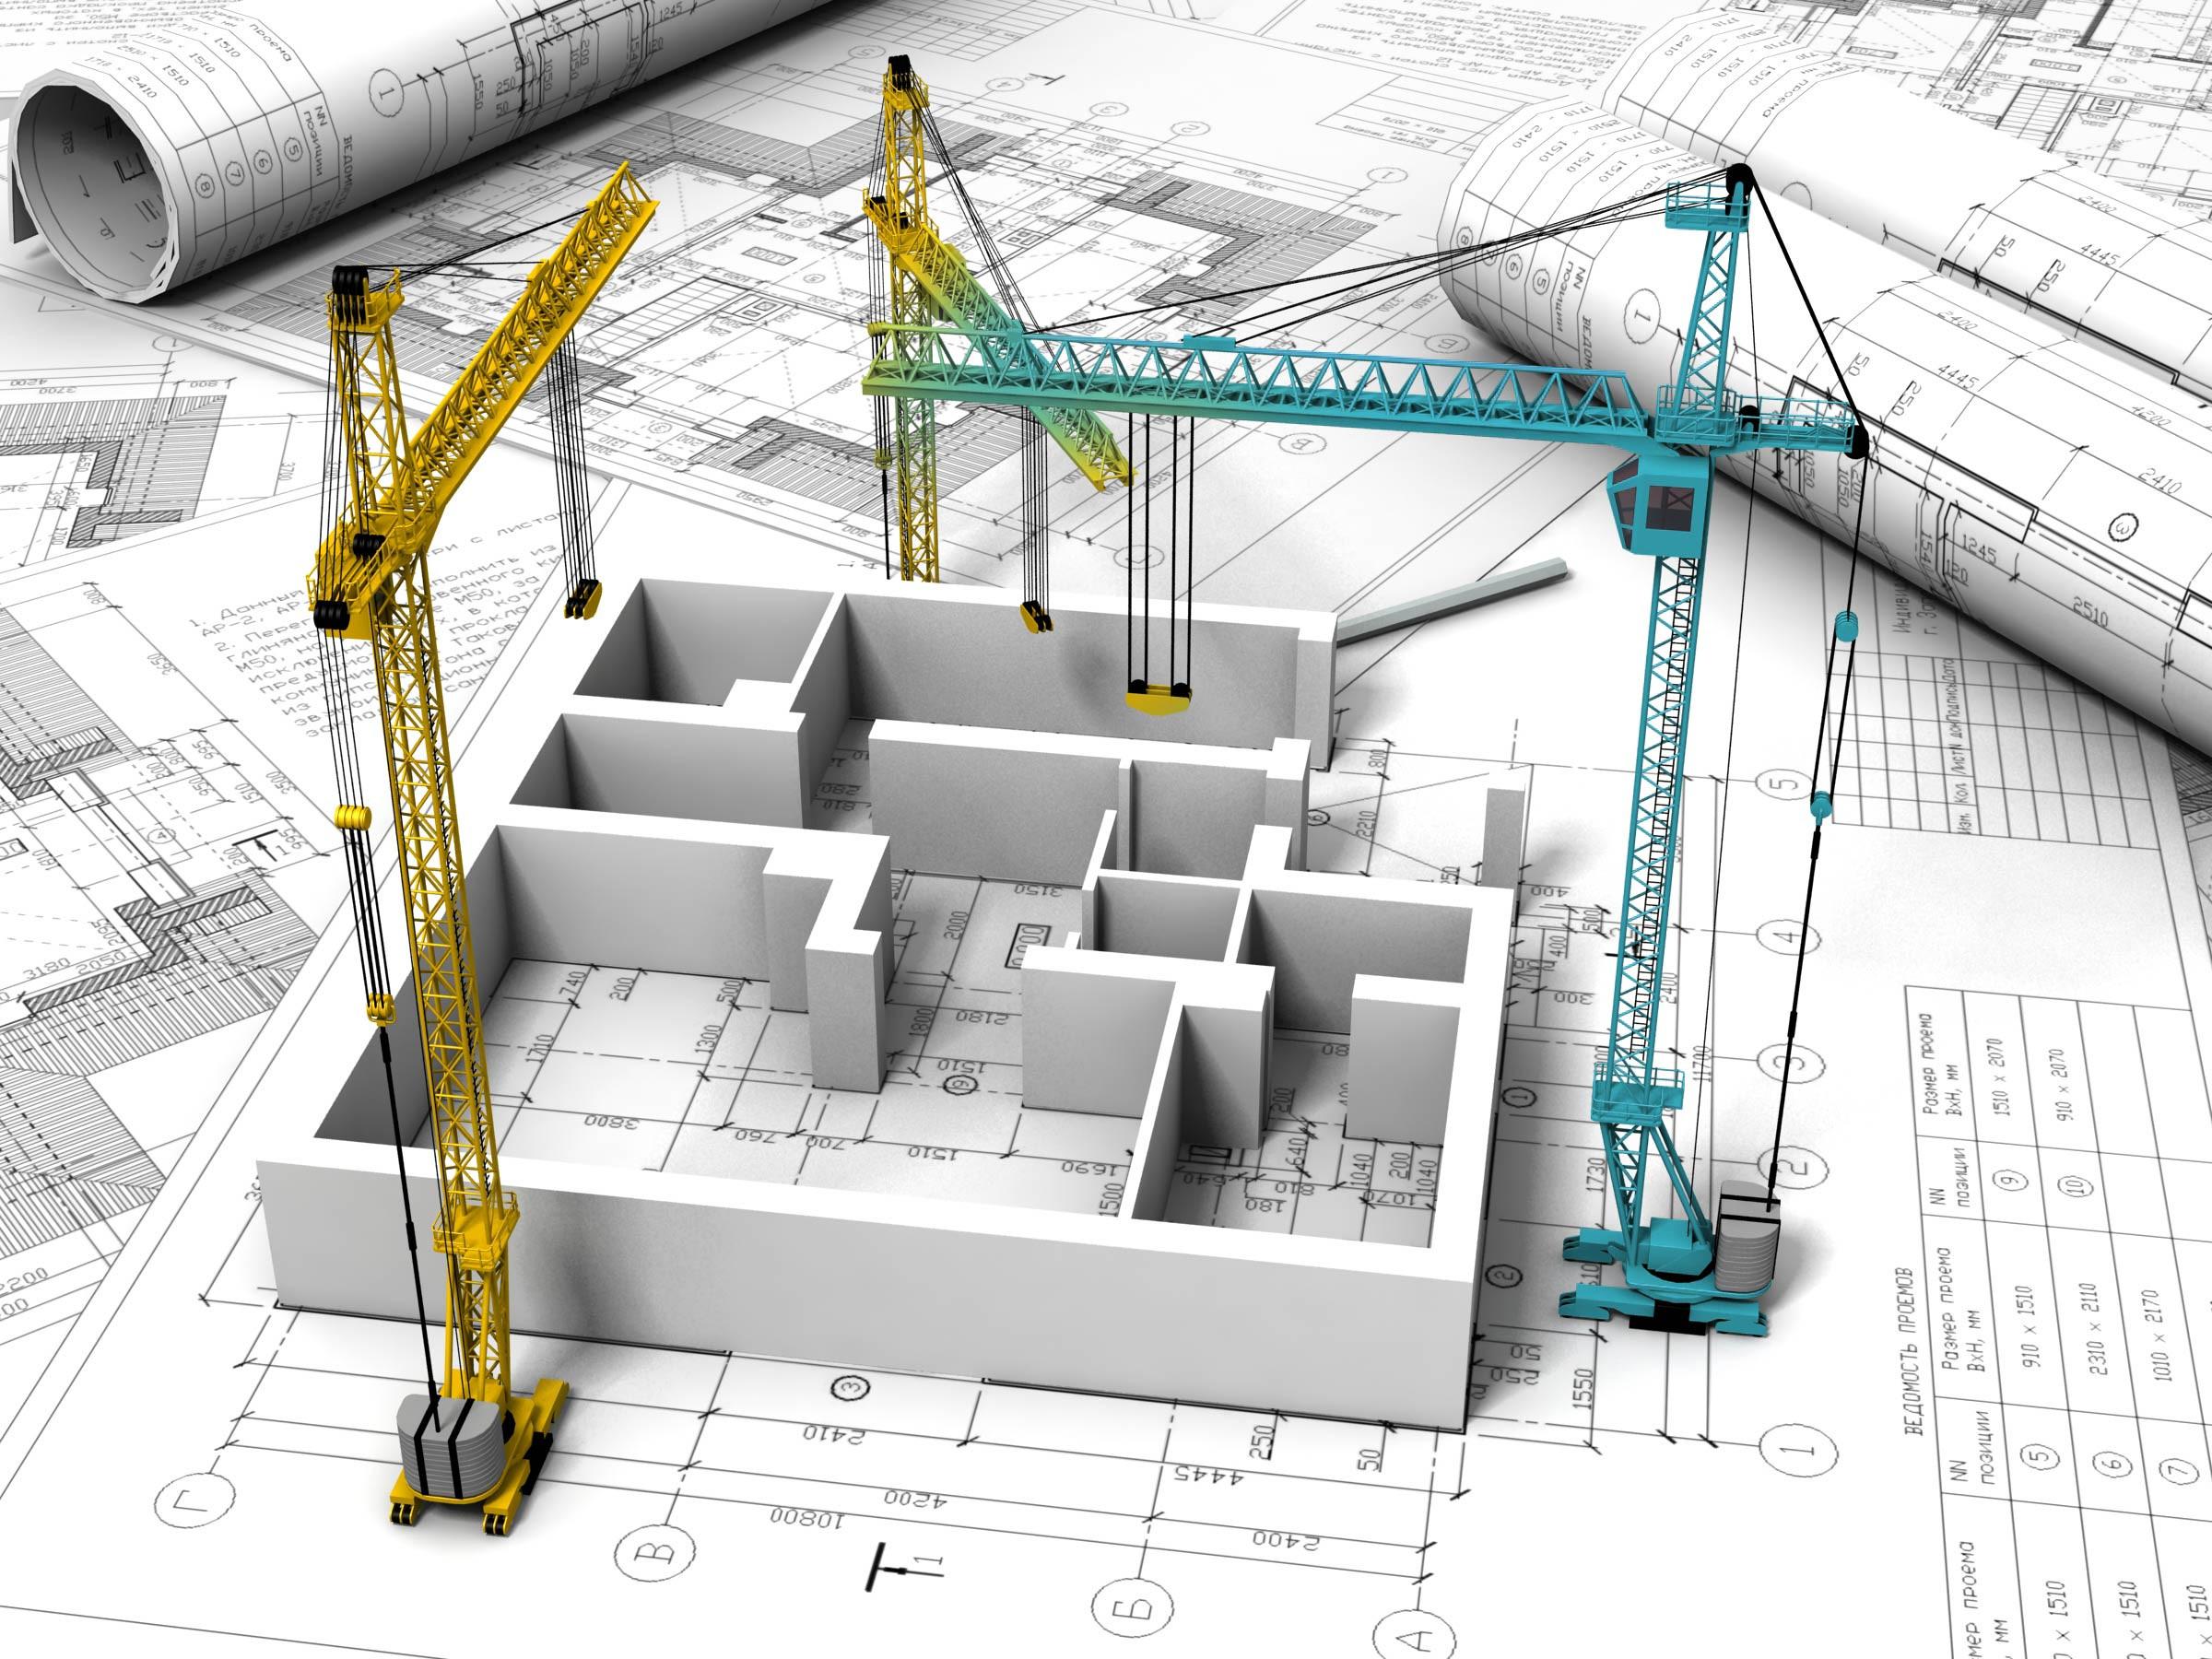 Real Estate Development - Land Planning